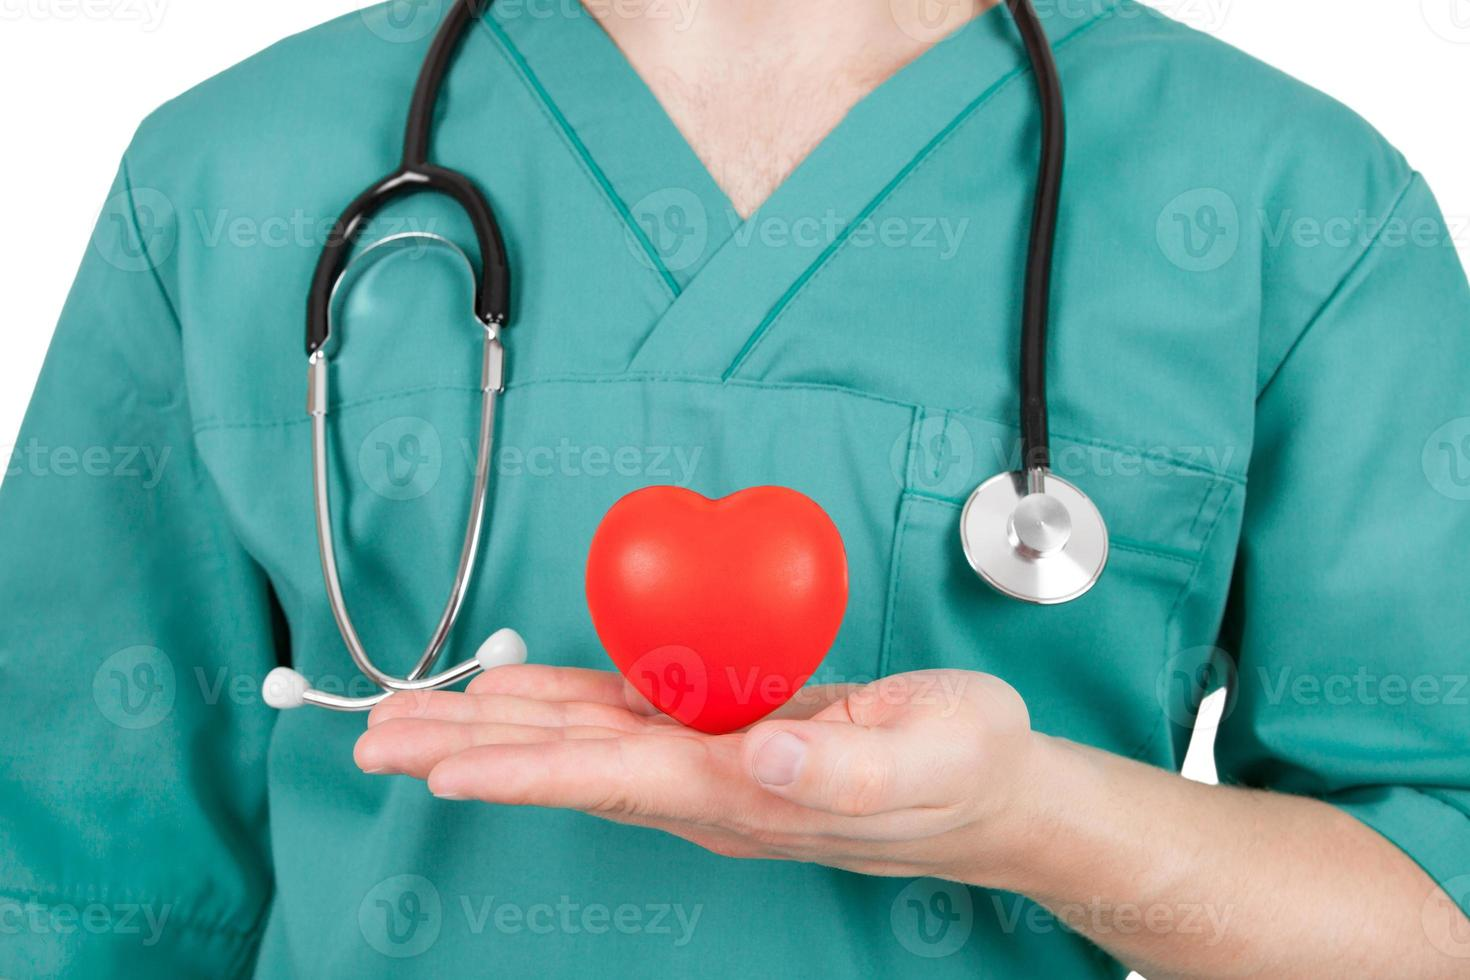 medicina e cuidados de saúde foto